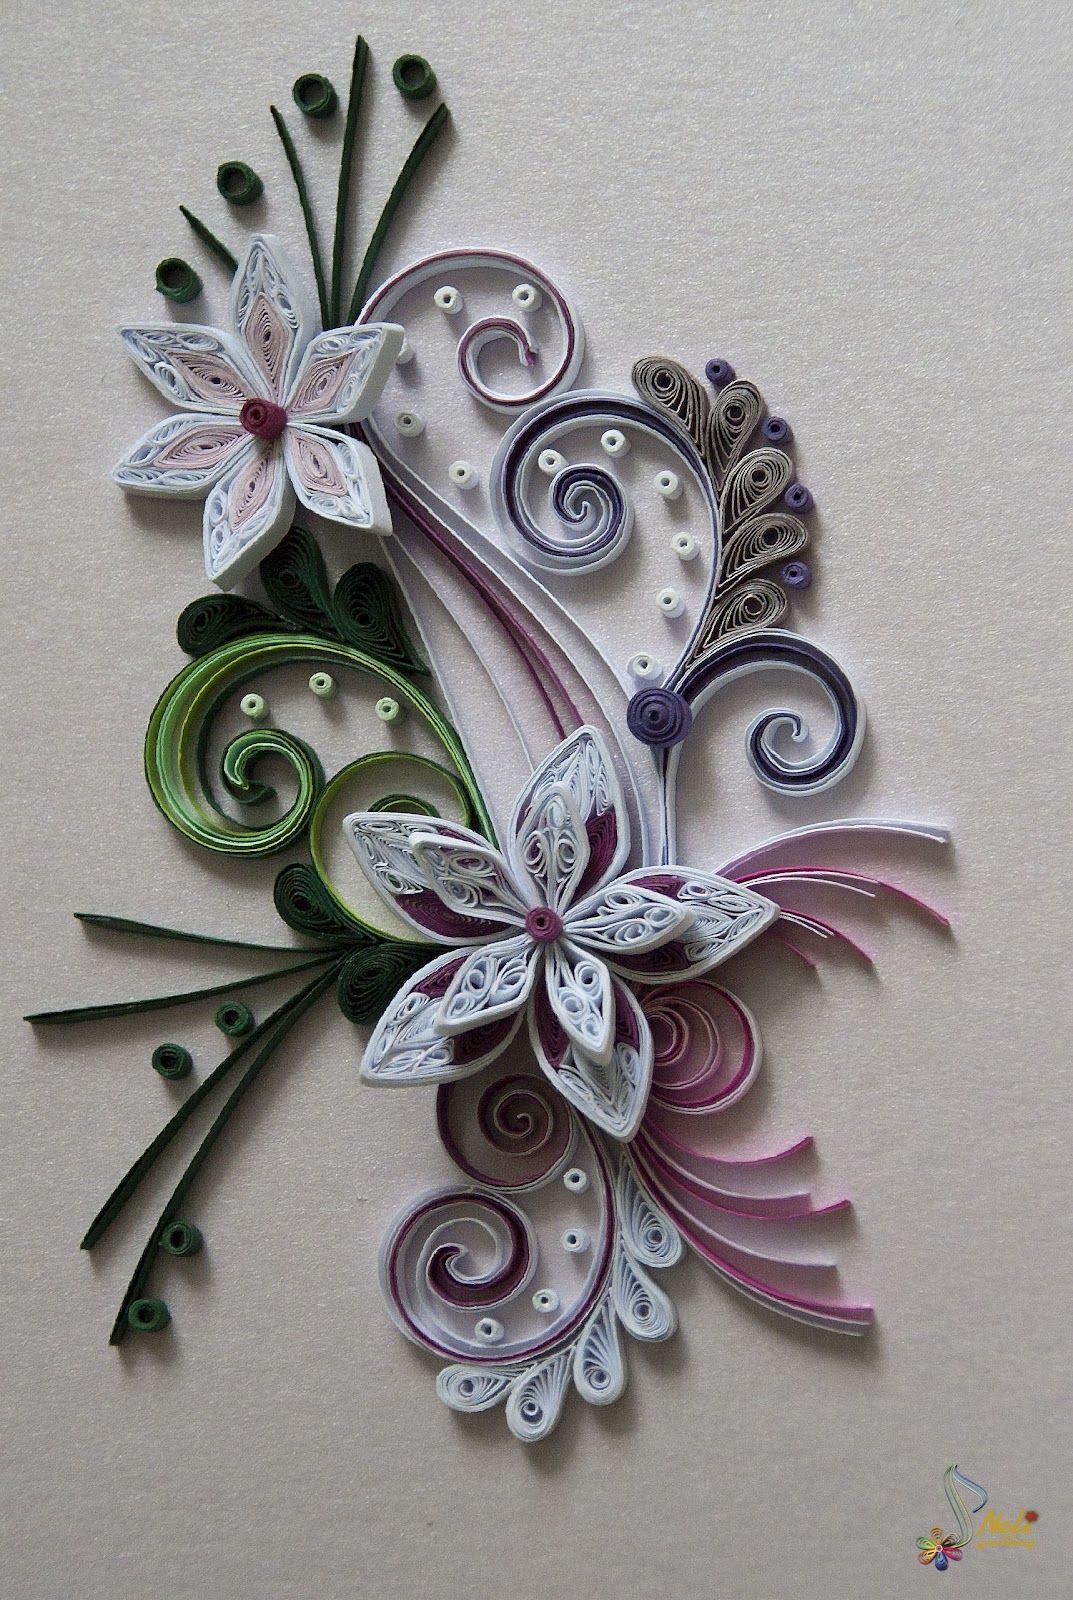 neli quilling art quilling card flowers tablouri pinterest projekte kreative ideen und. Black Bedroom Furniture Sets. Home Design Ideas